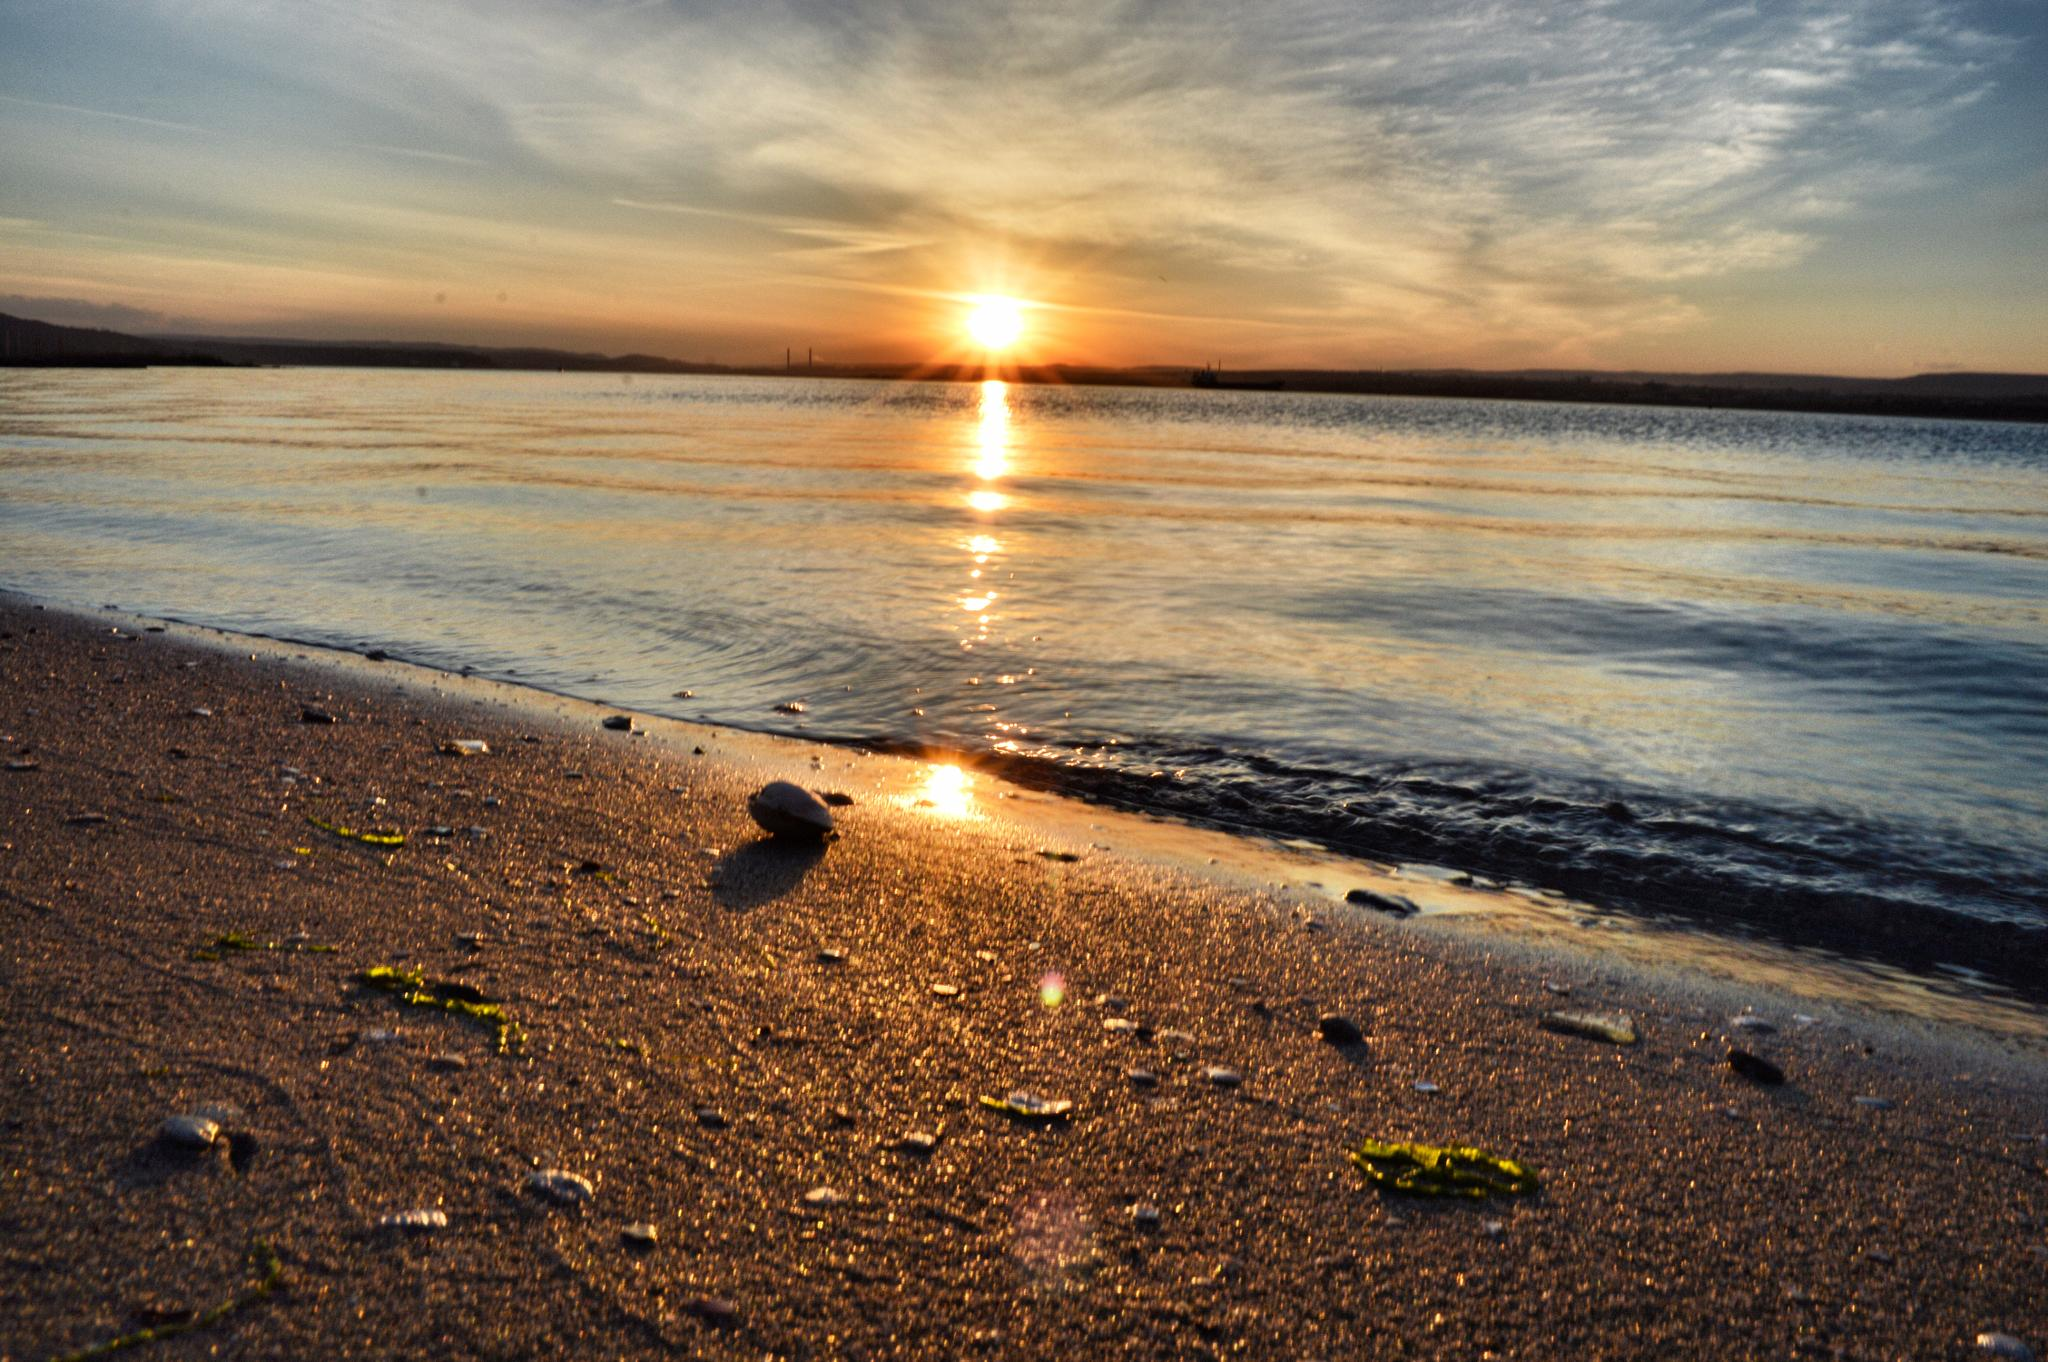 Sunset by Galq Fo-teva